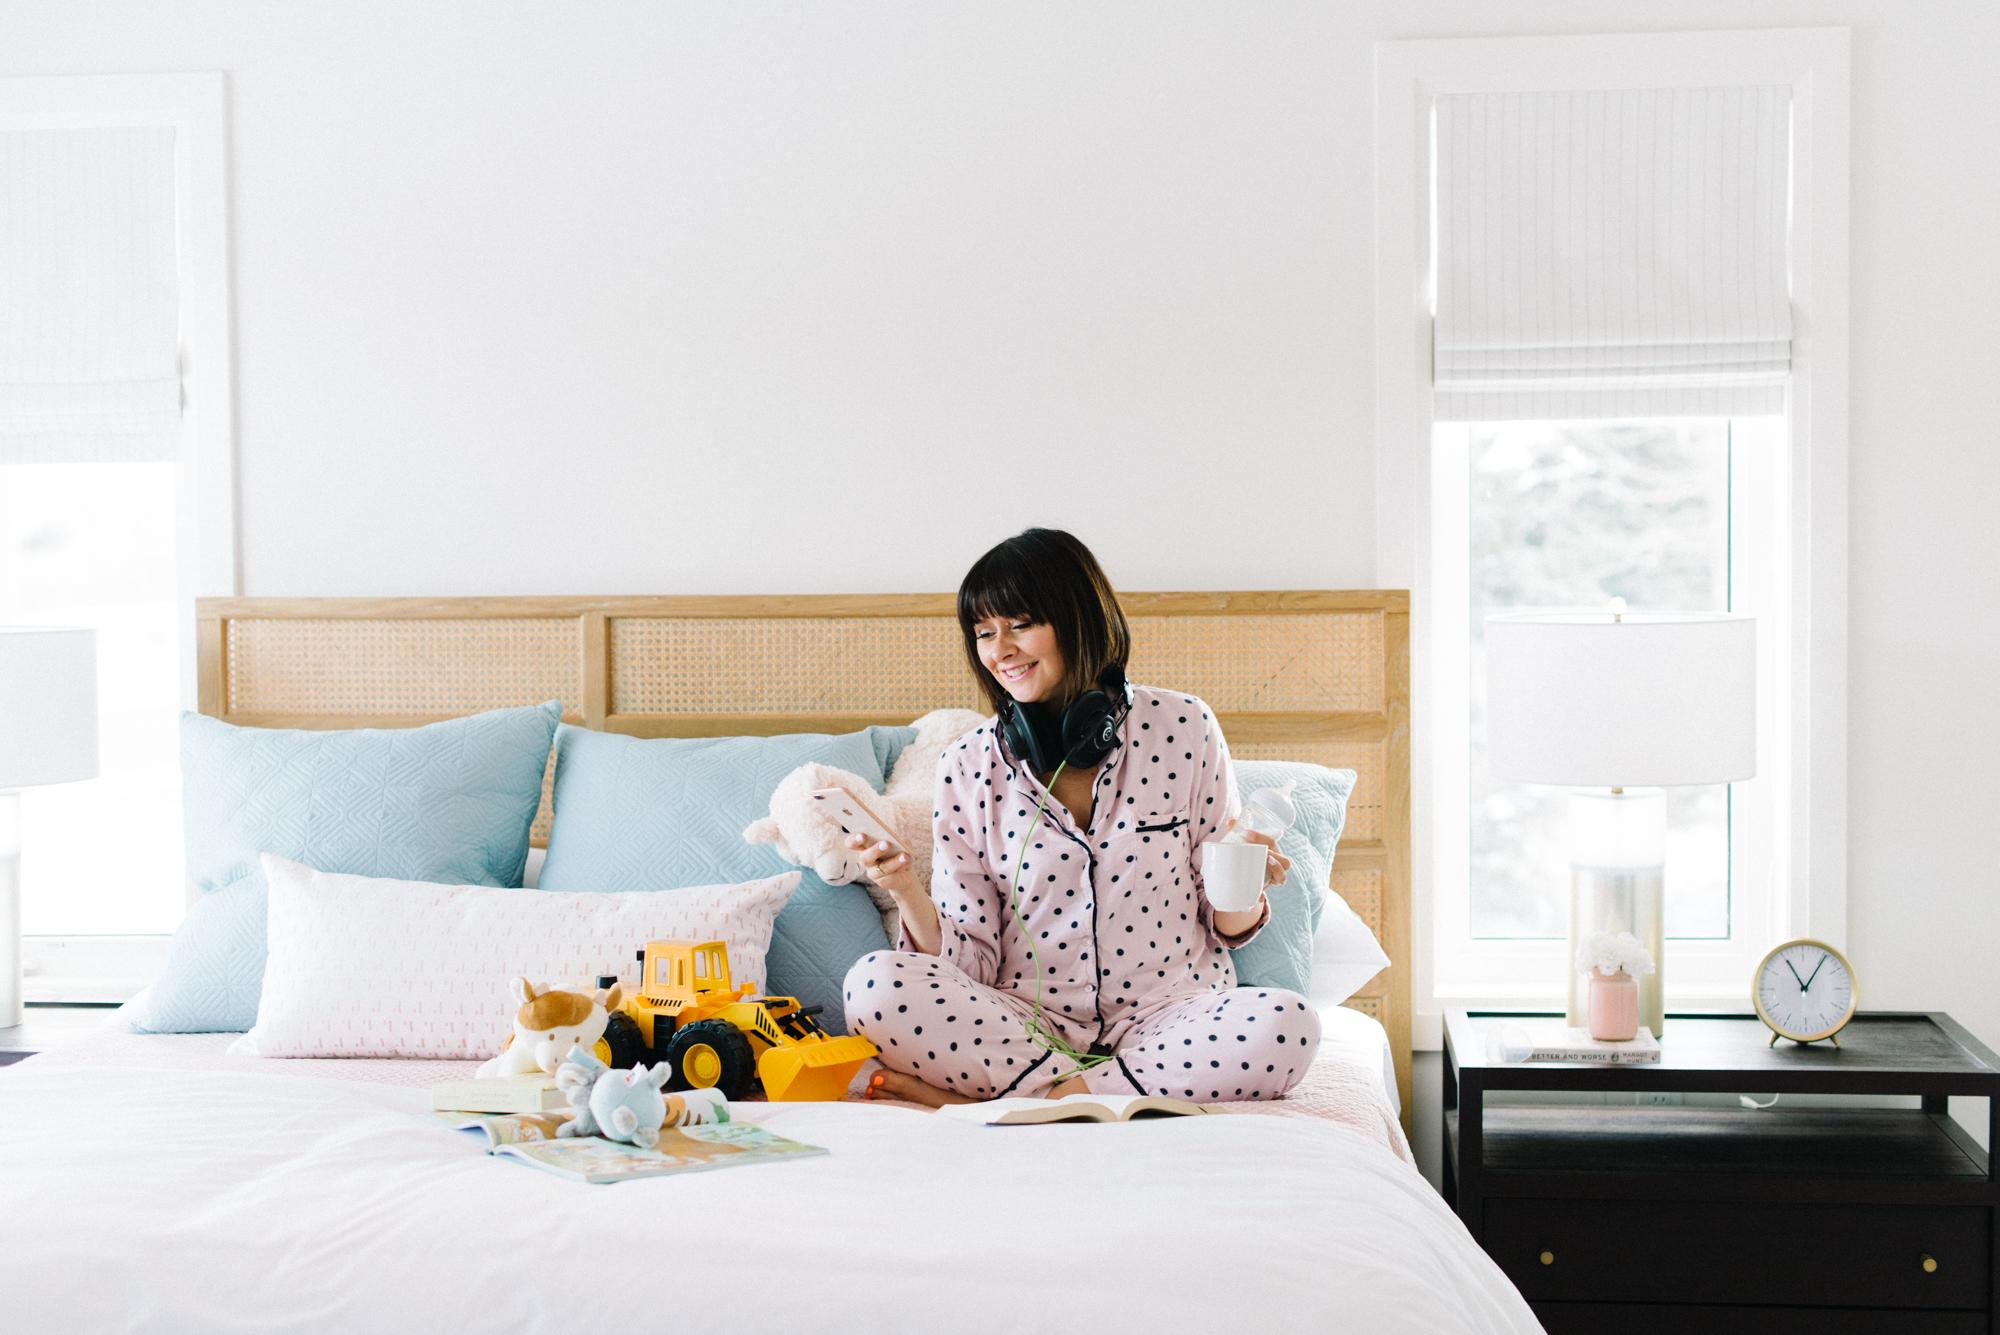 StefEthan-RebeccaHayDesigns-Aurora-InteriorDesigner-InteriorDesign-TorontoPortraitPhotographer-LifestylePhotography-TorontoInteriorDesigner-16.JPG